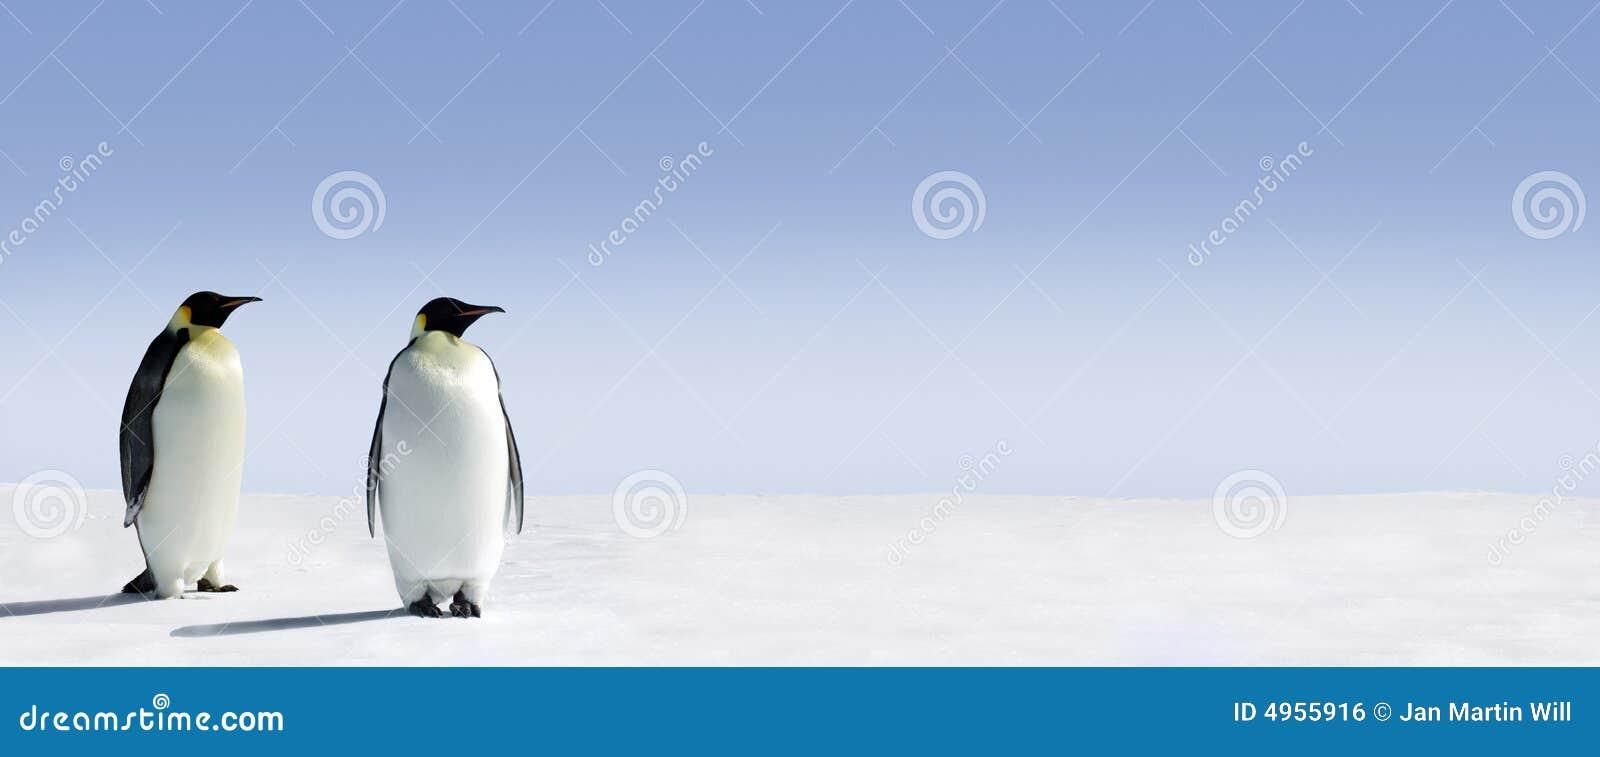 Panorama de dois pinguins